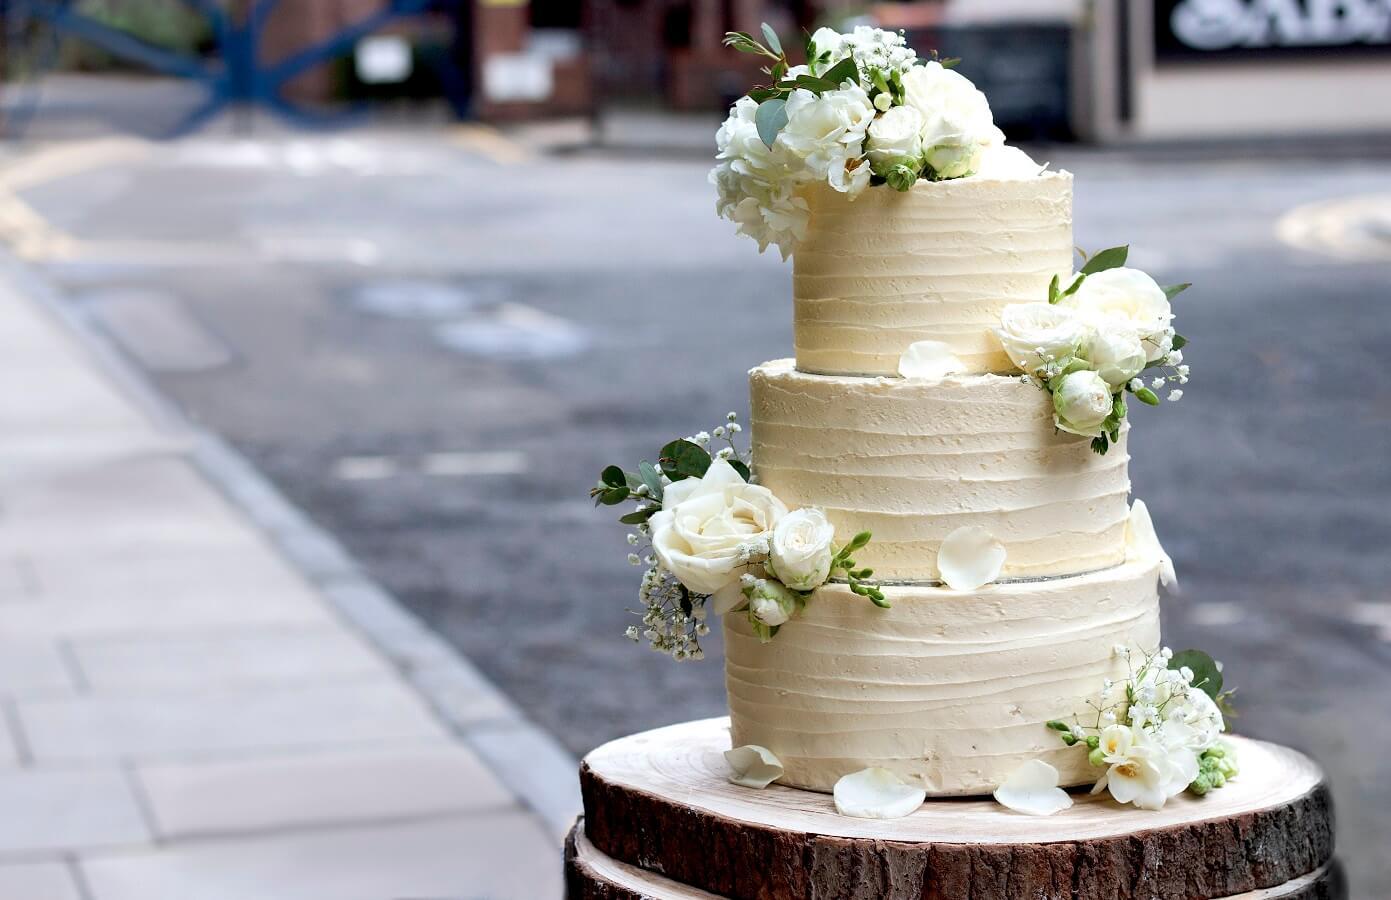 presenting a vegan take on the royal wedding cake vegan take on the royal wedding cake